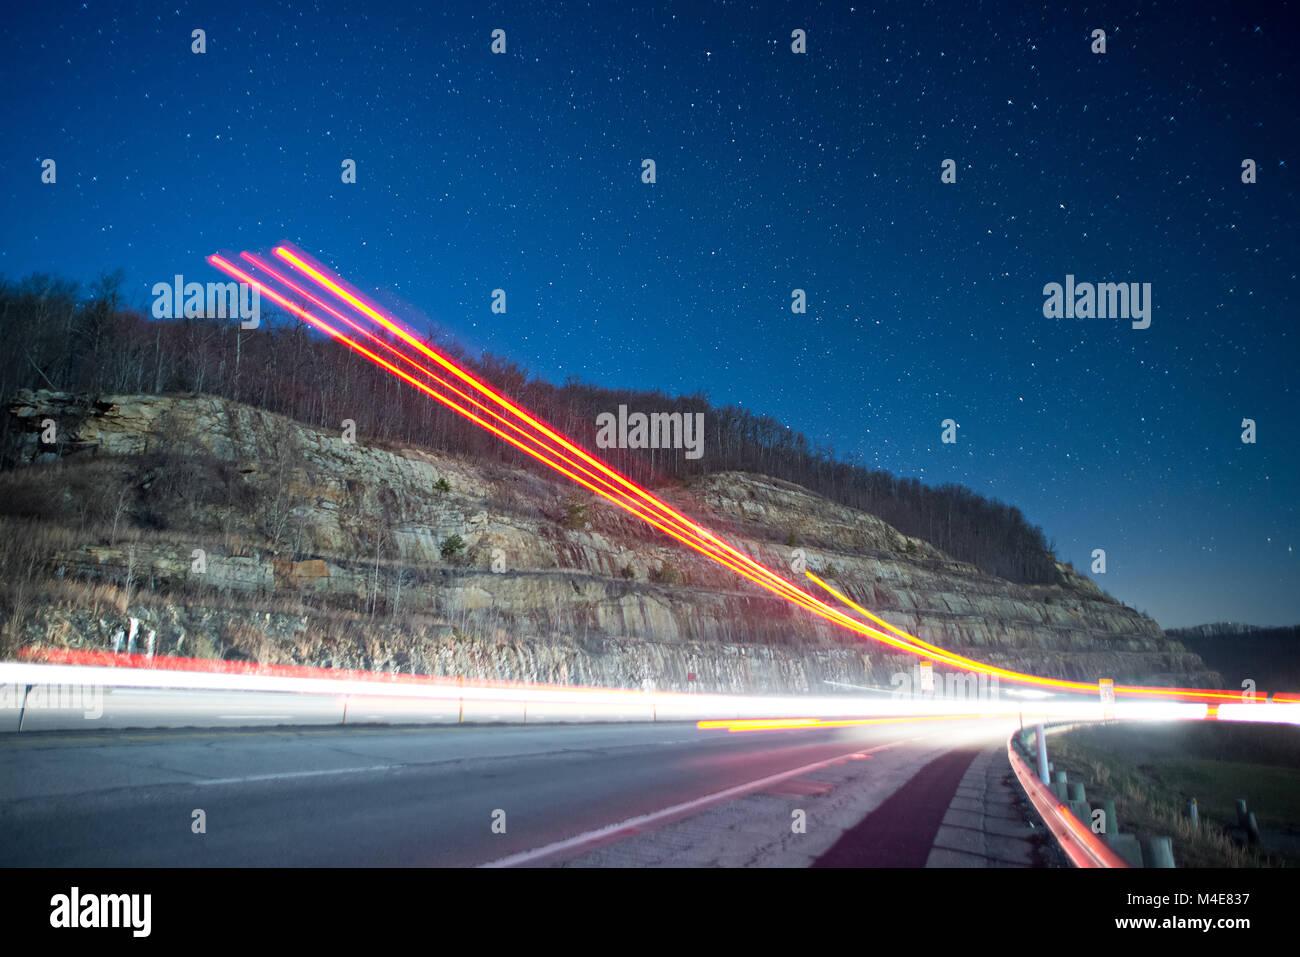 Sentieri di luce di notte in montagna dal traffico in uscita Foto Stock